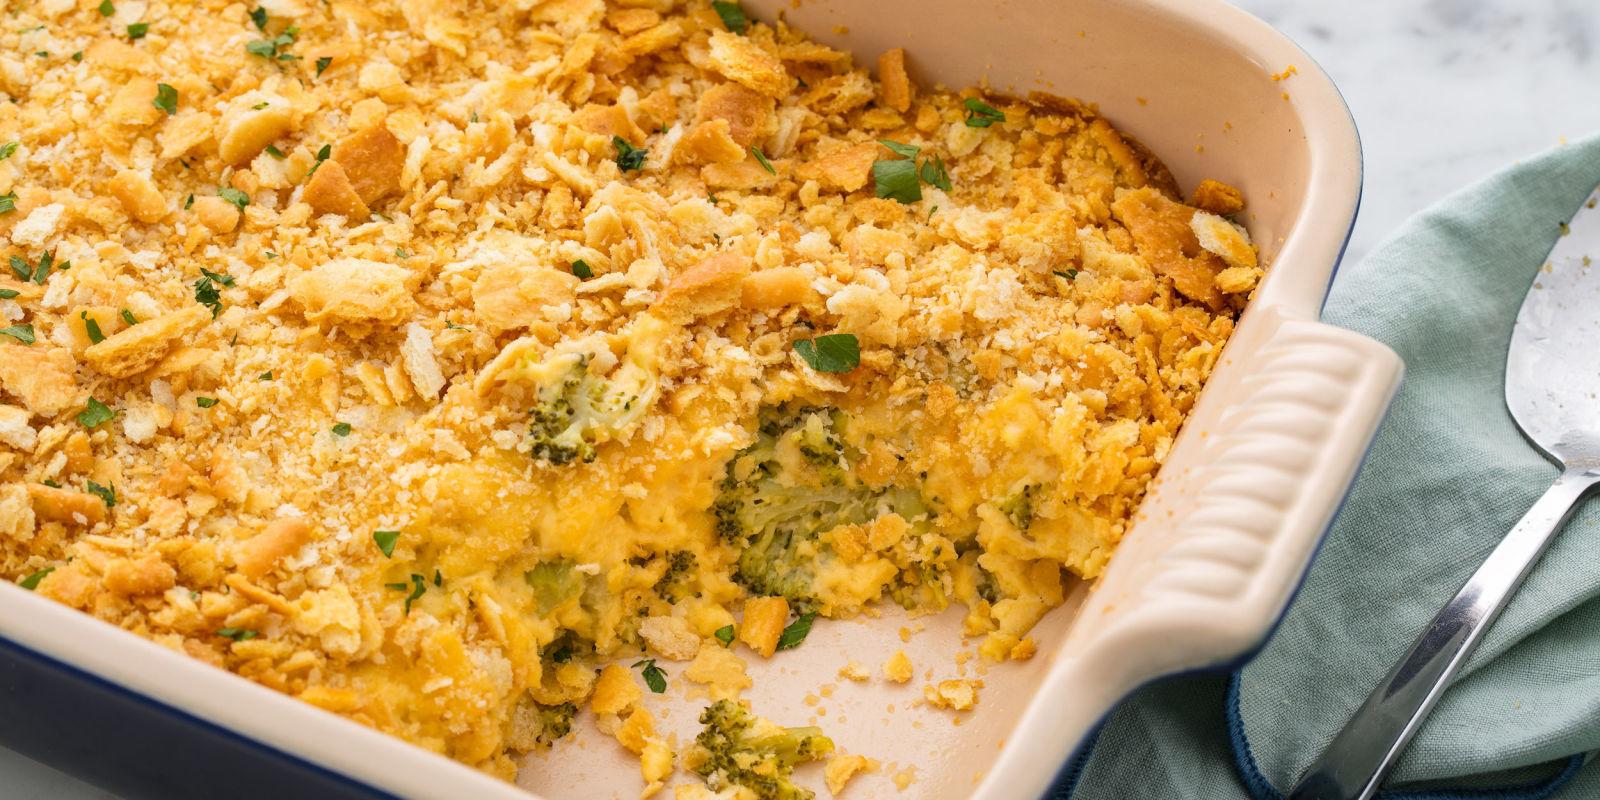 Easy broccoli cheese casserole recipe how to make cheesy for Broccoli casserole with fresh broccoli